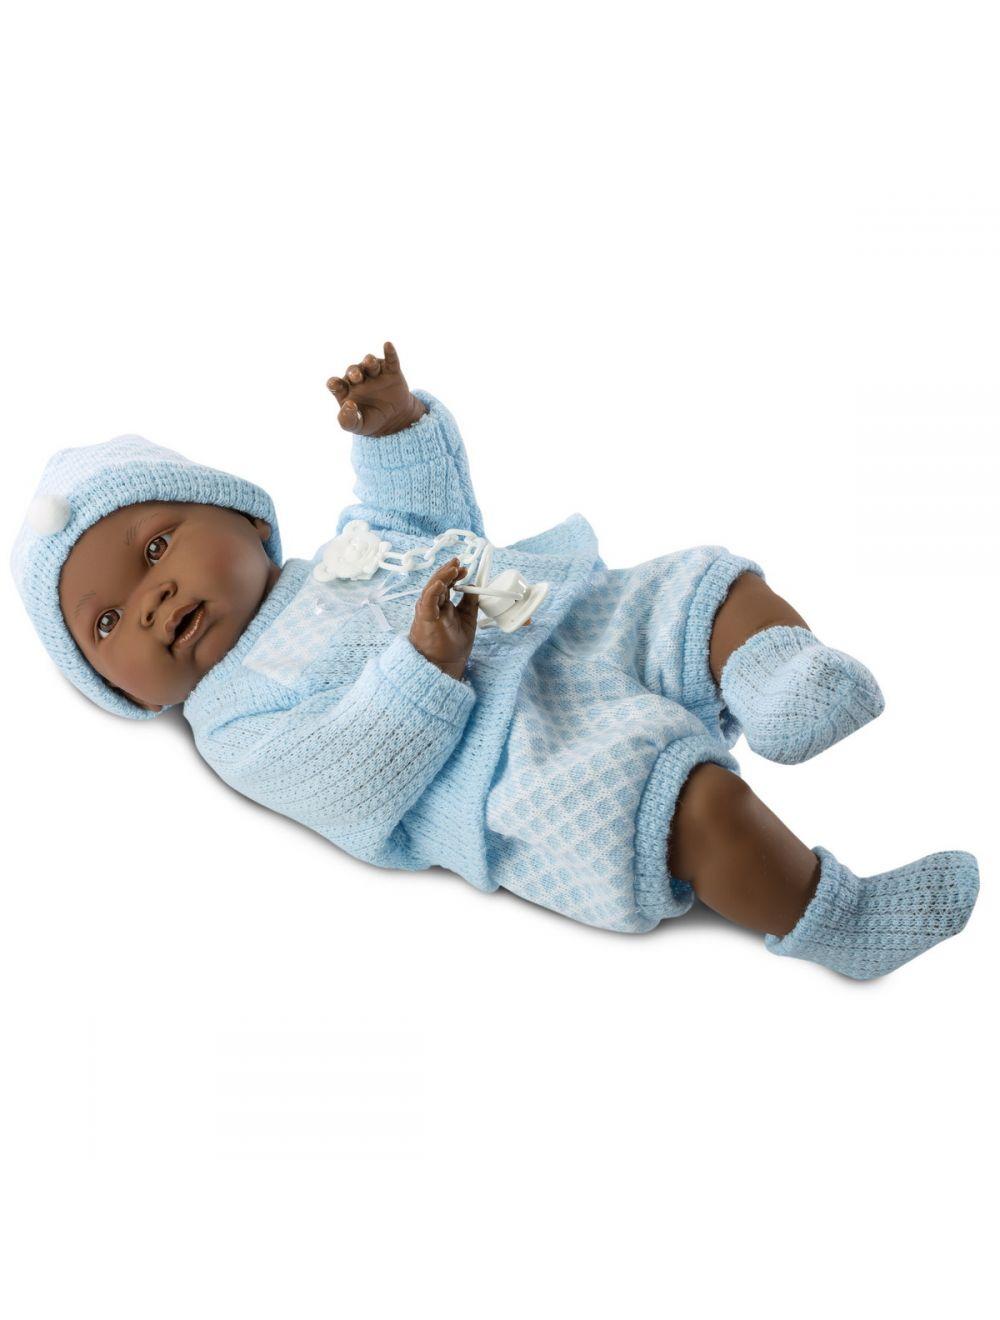 Llorens 45025 bobas Noe 45 cm błękitny sweterek ciemnoskóry FB